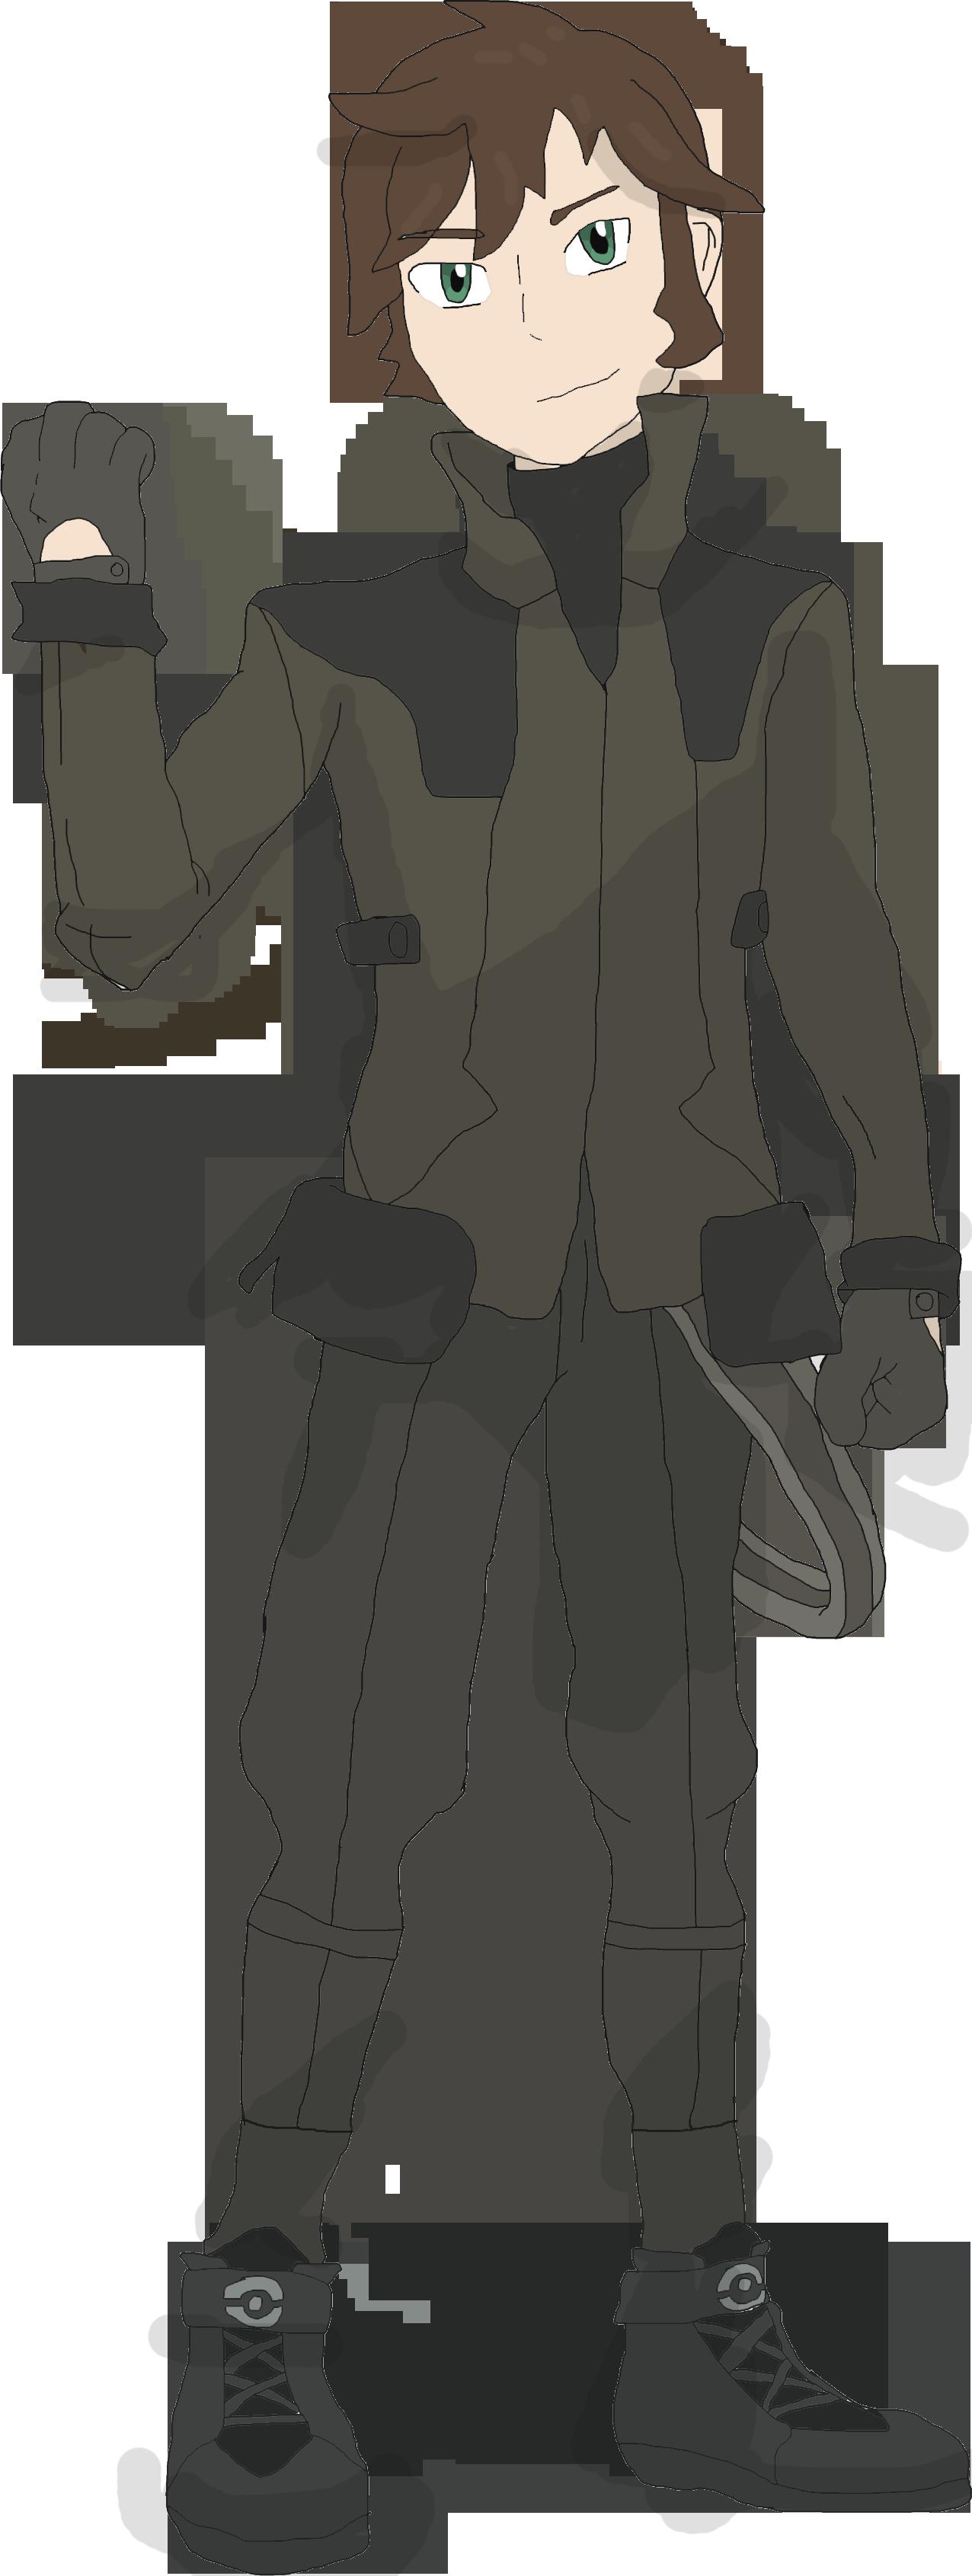 Landon (gym leader)